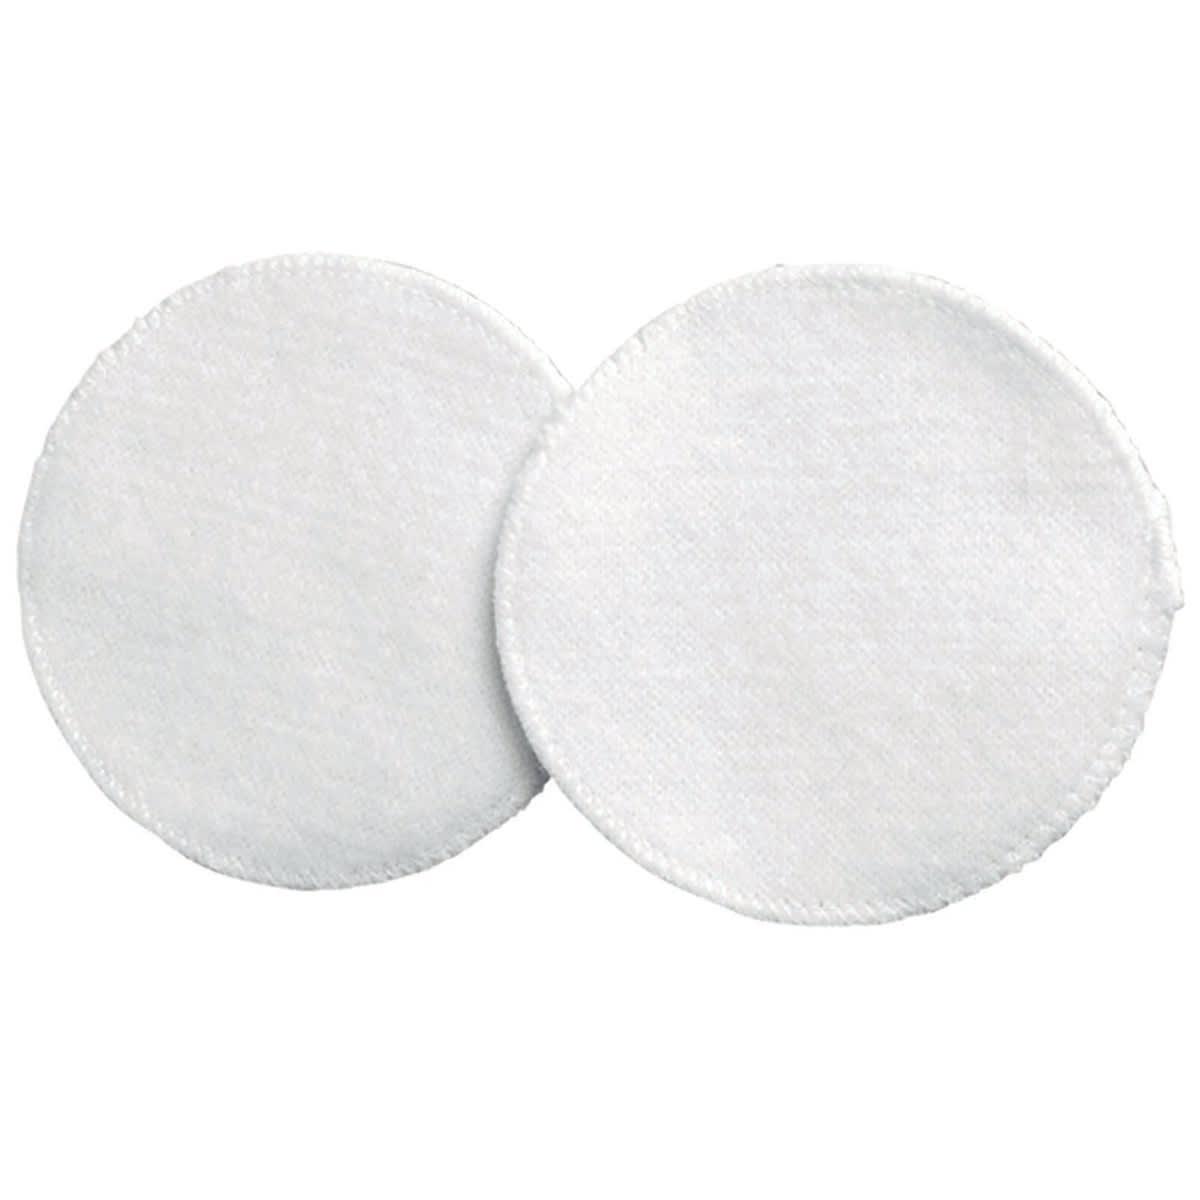 10 cm - 4 tynde, åndbare lag inkl. bomuld - Vaskepose medfølger